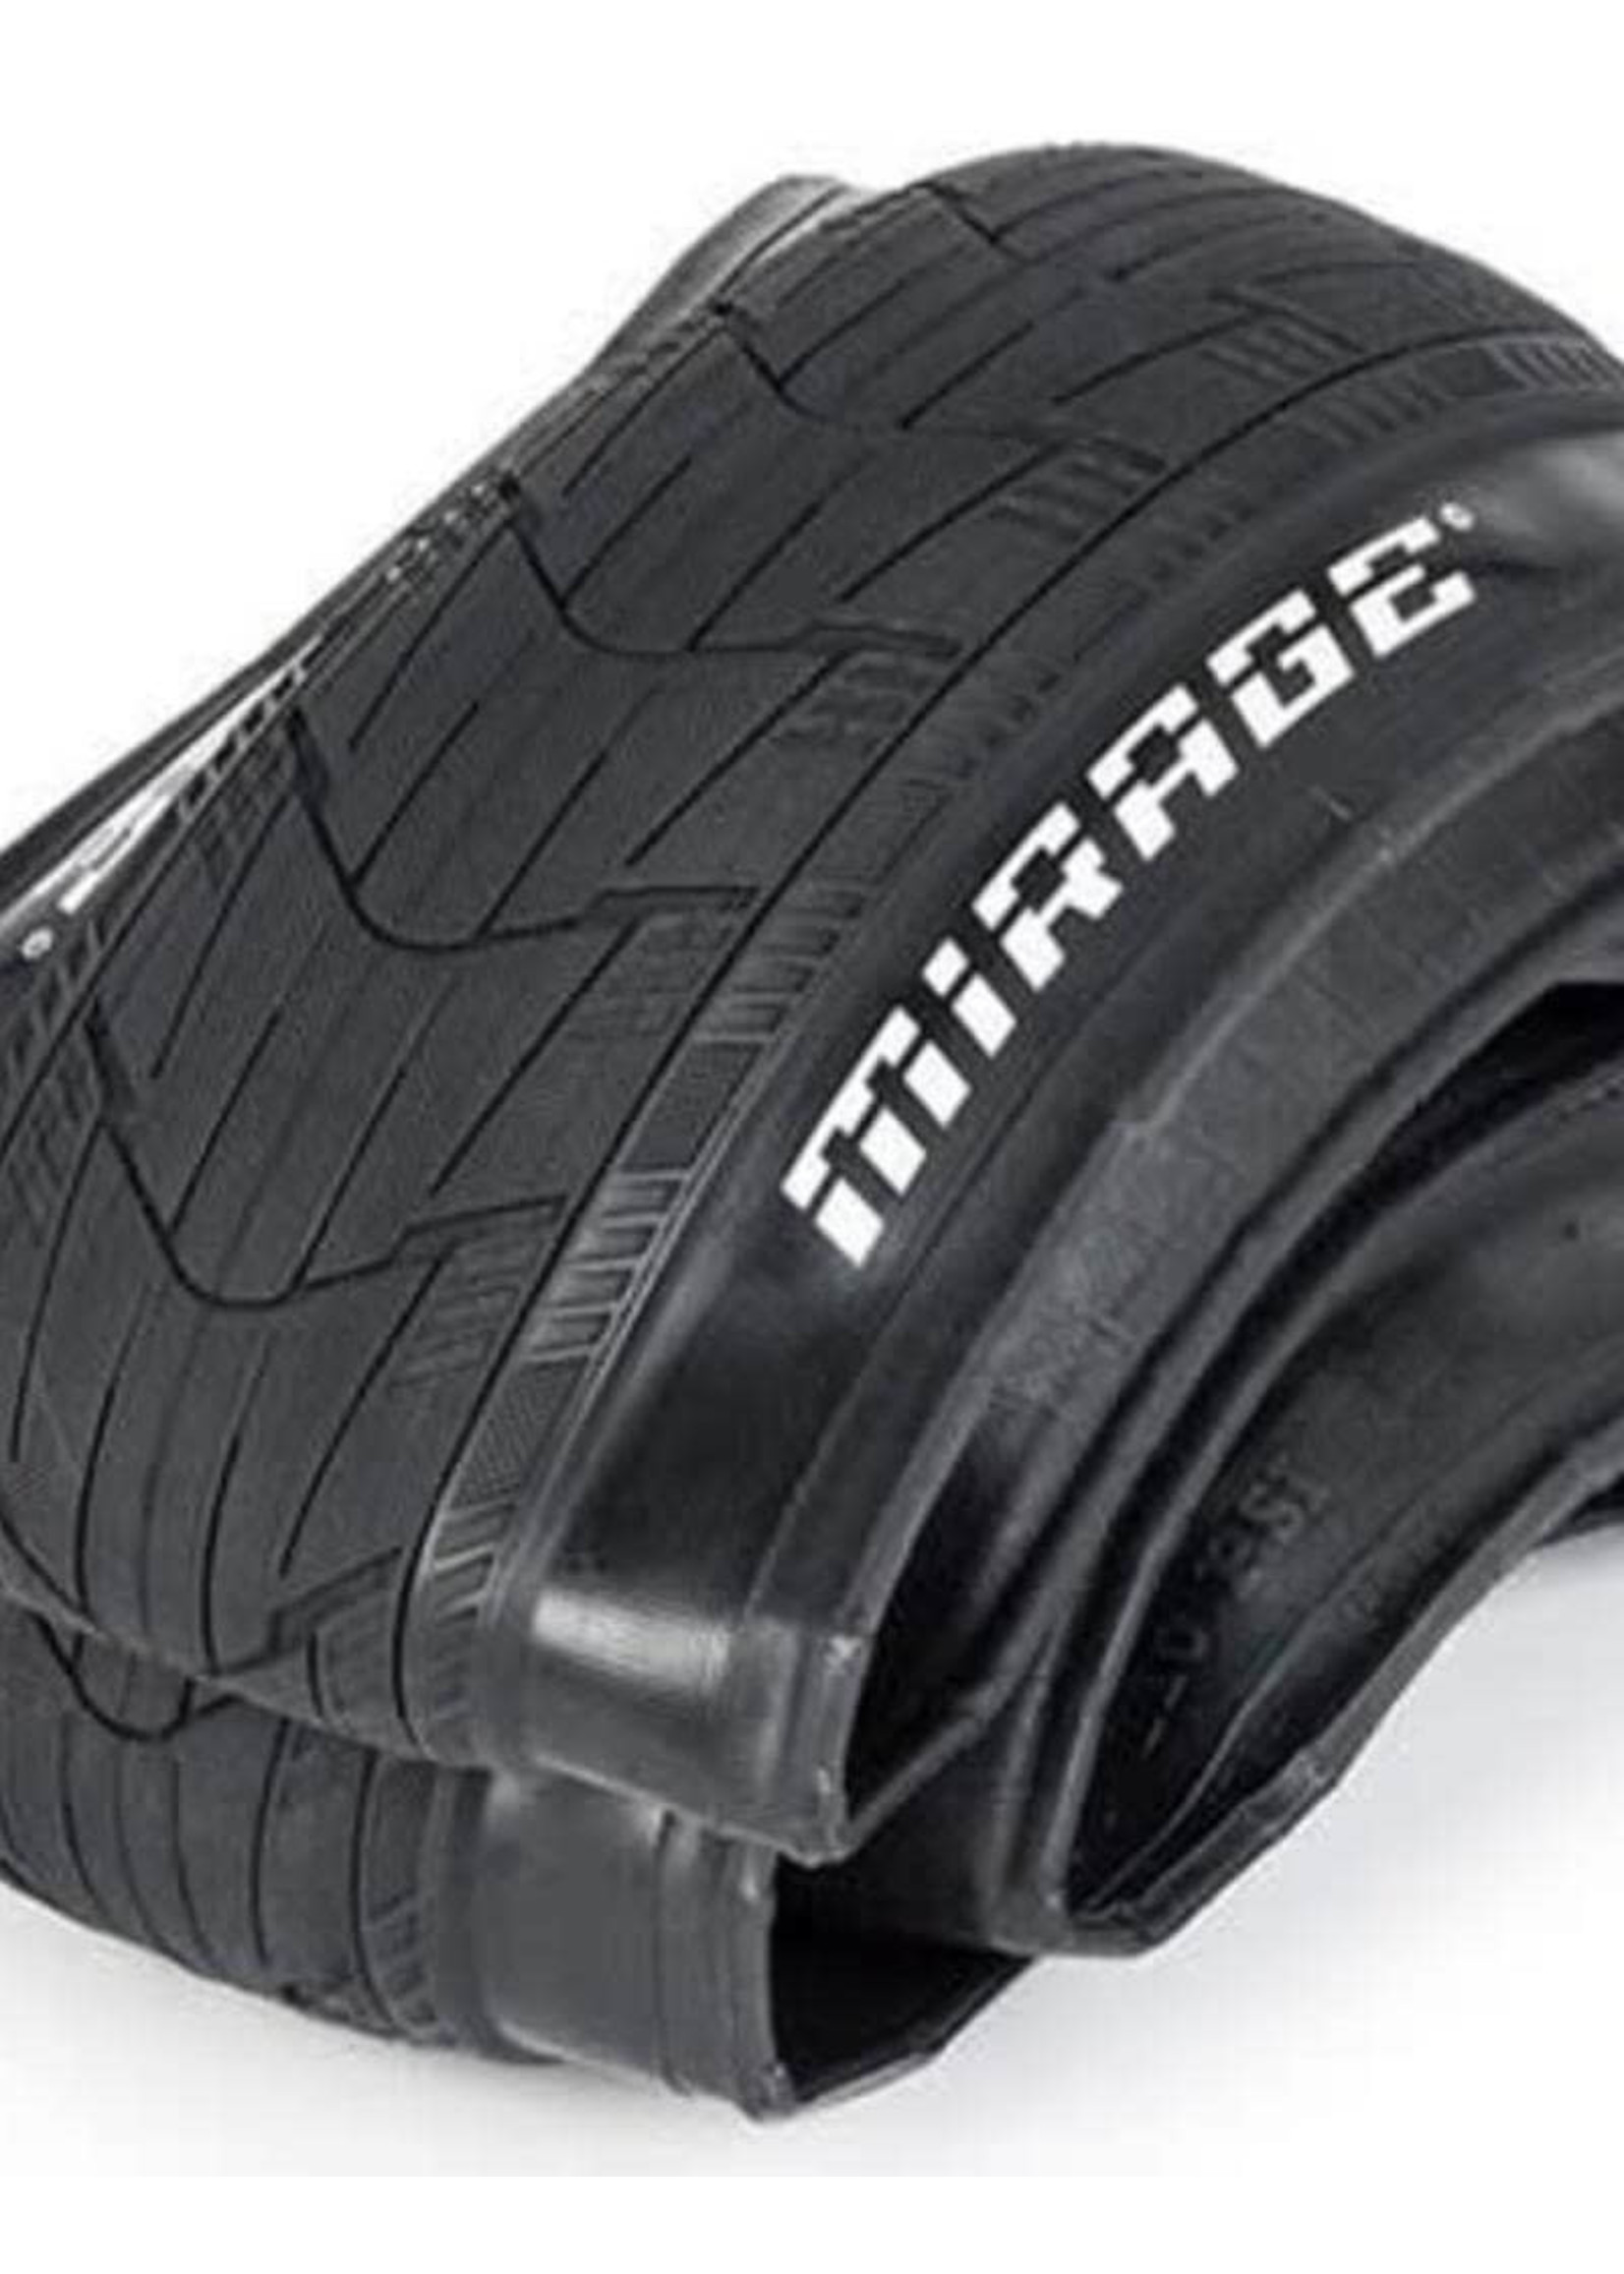 Eclat Eclat - Mirage Lightweight Tire - Folding